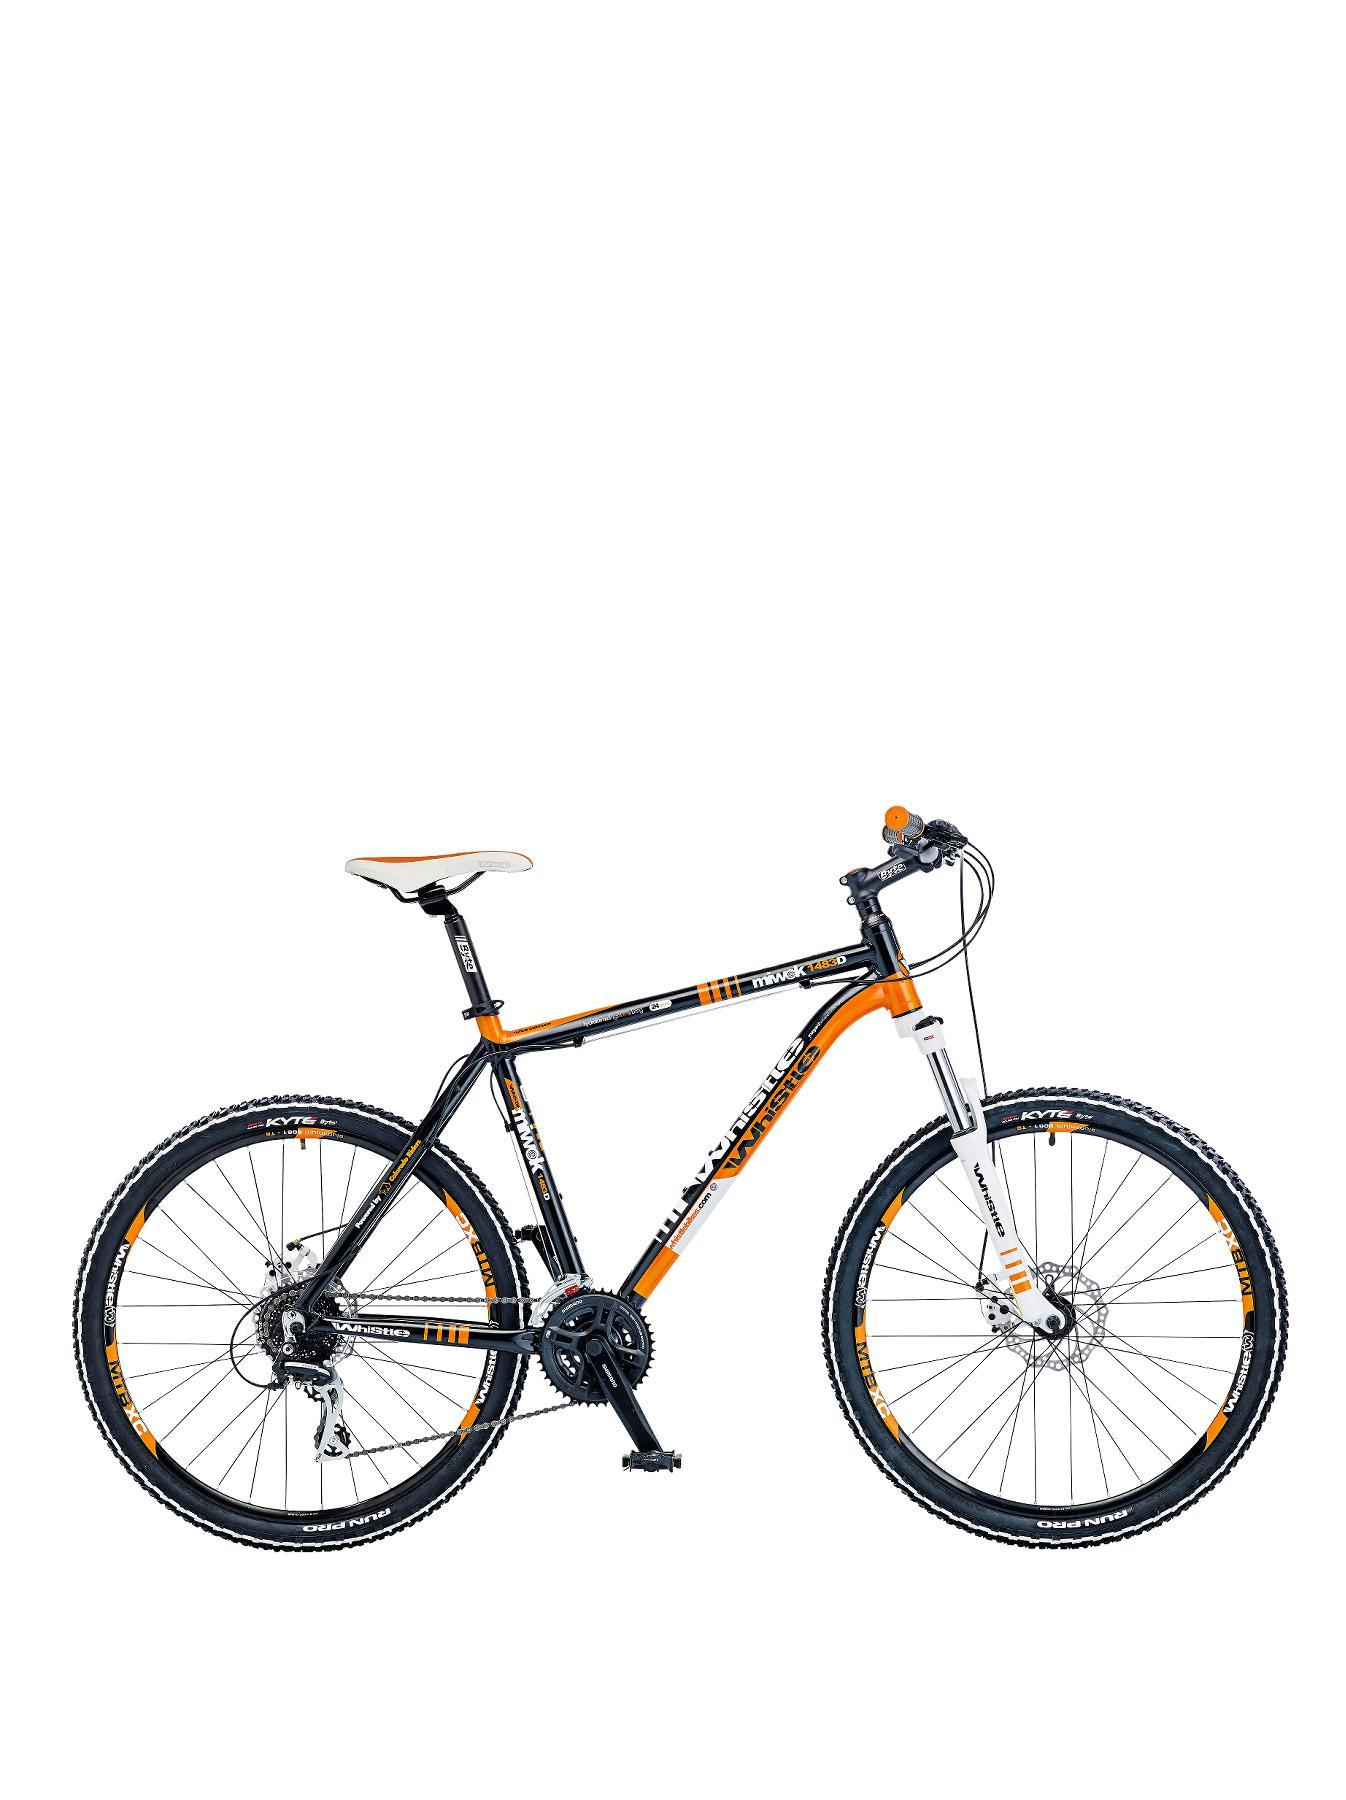 Whistle Miwok 1483D 18 inch Frame 26 inch Wheel Alloy Mens Mountain Terrain Bike